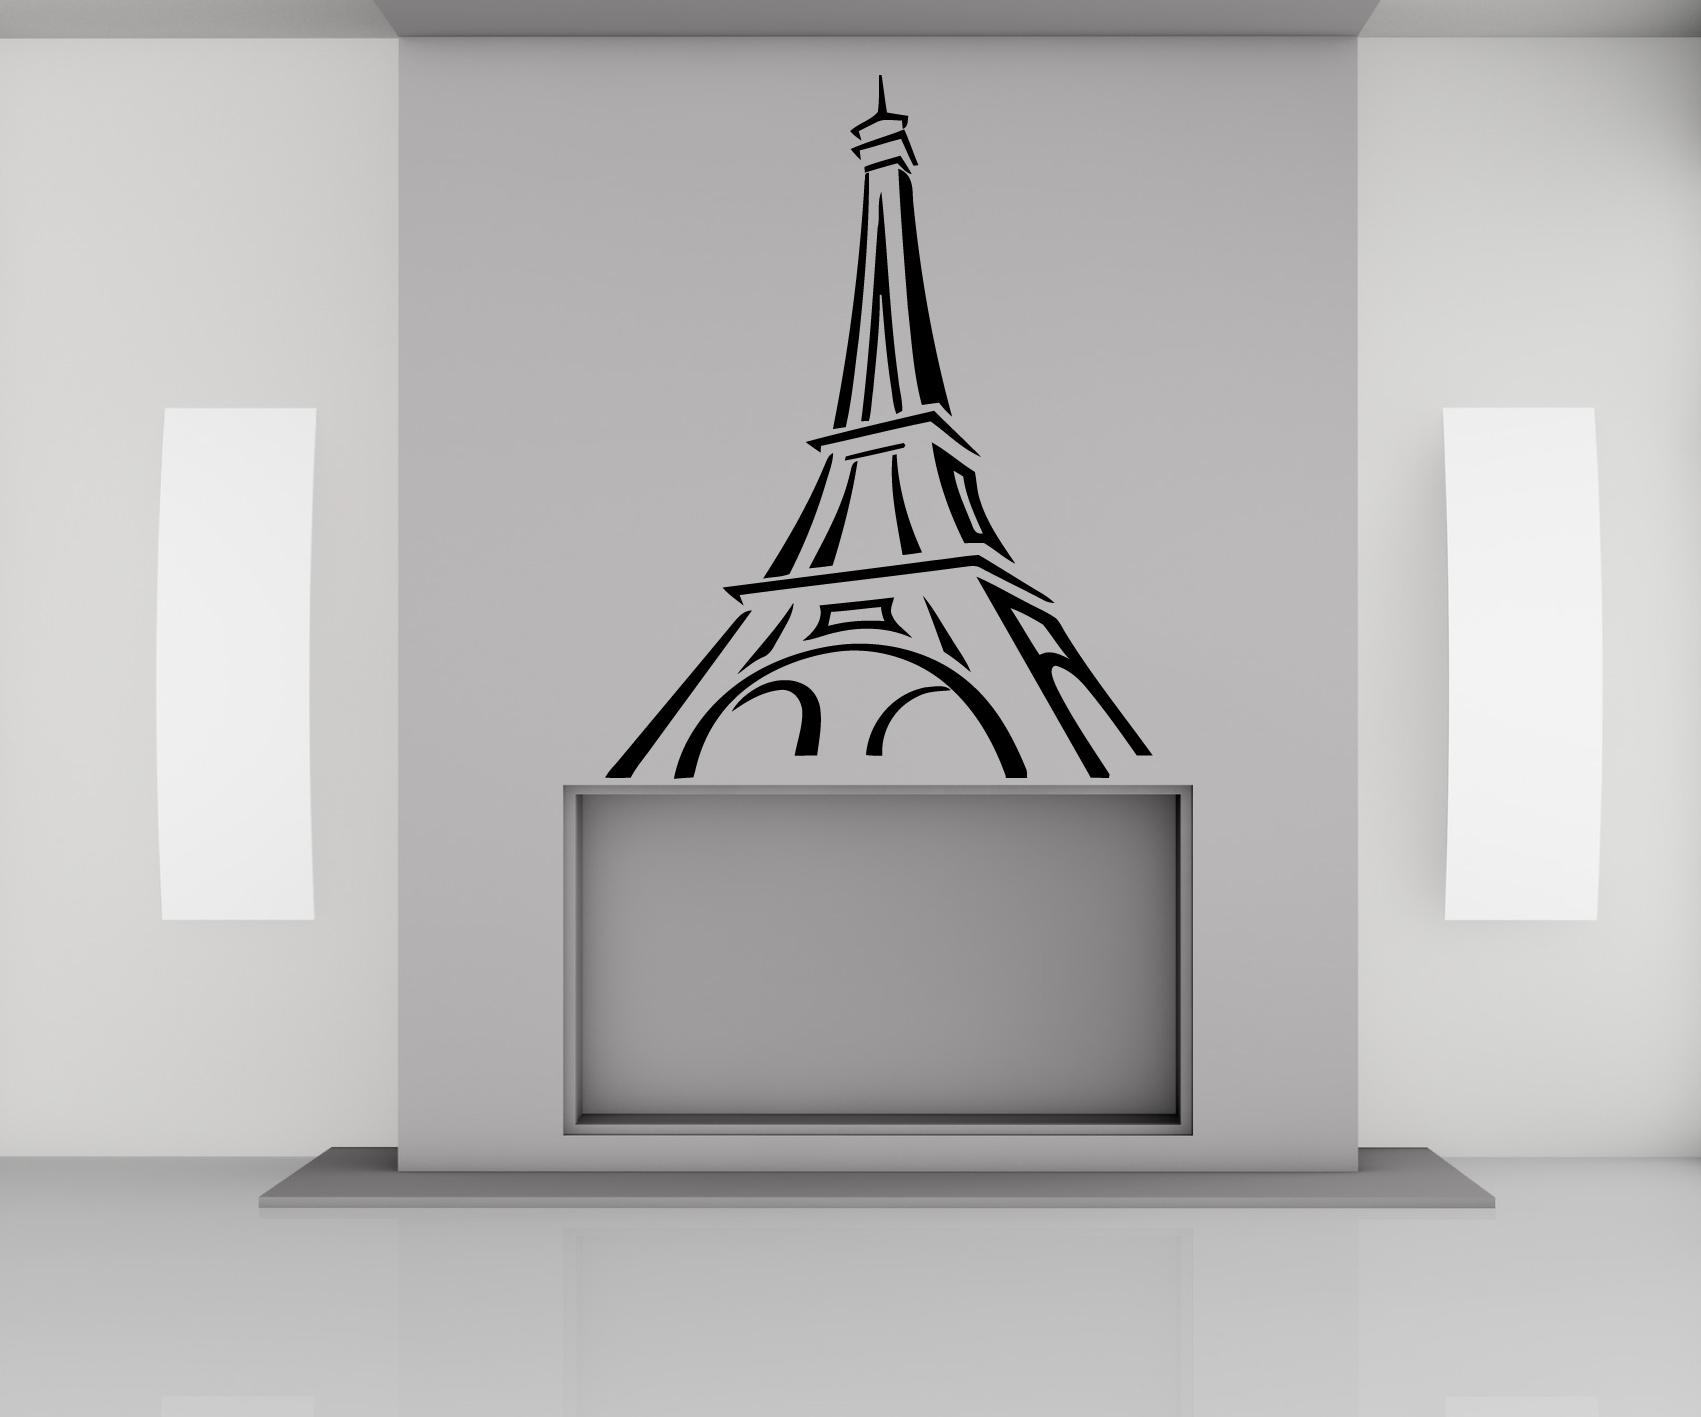 Eiffel Tower – Paris Vinyl Wall Art Stickers Decal Regarding Paris Vinyl Wall Art (Image 6 of 20)